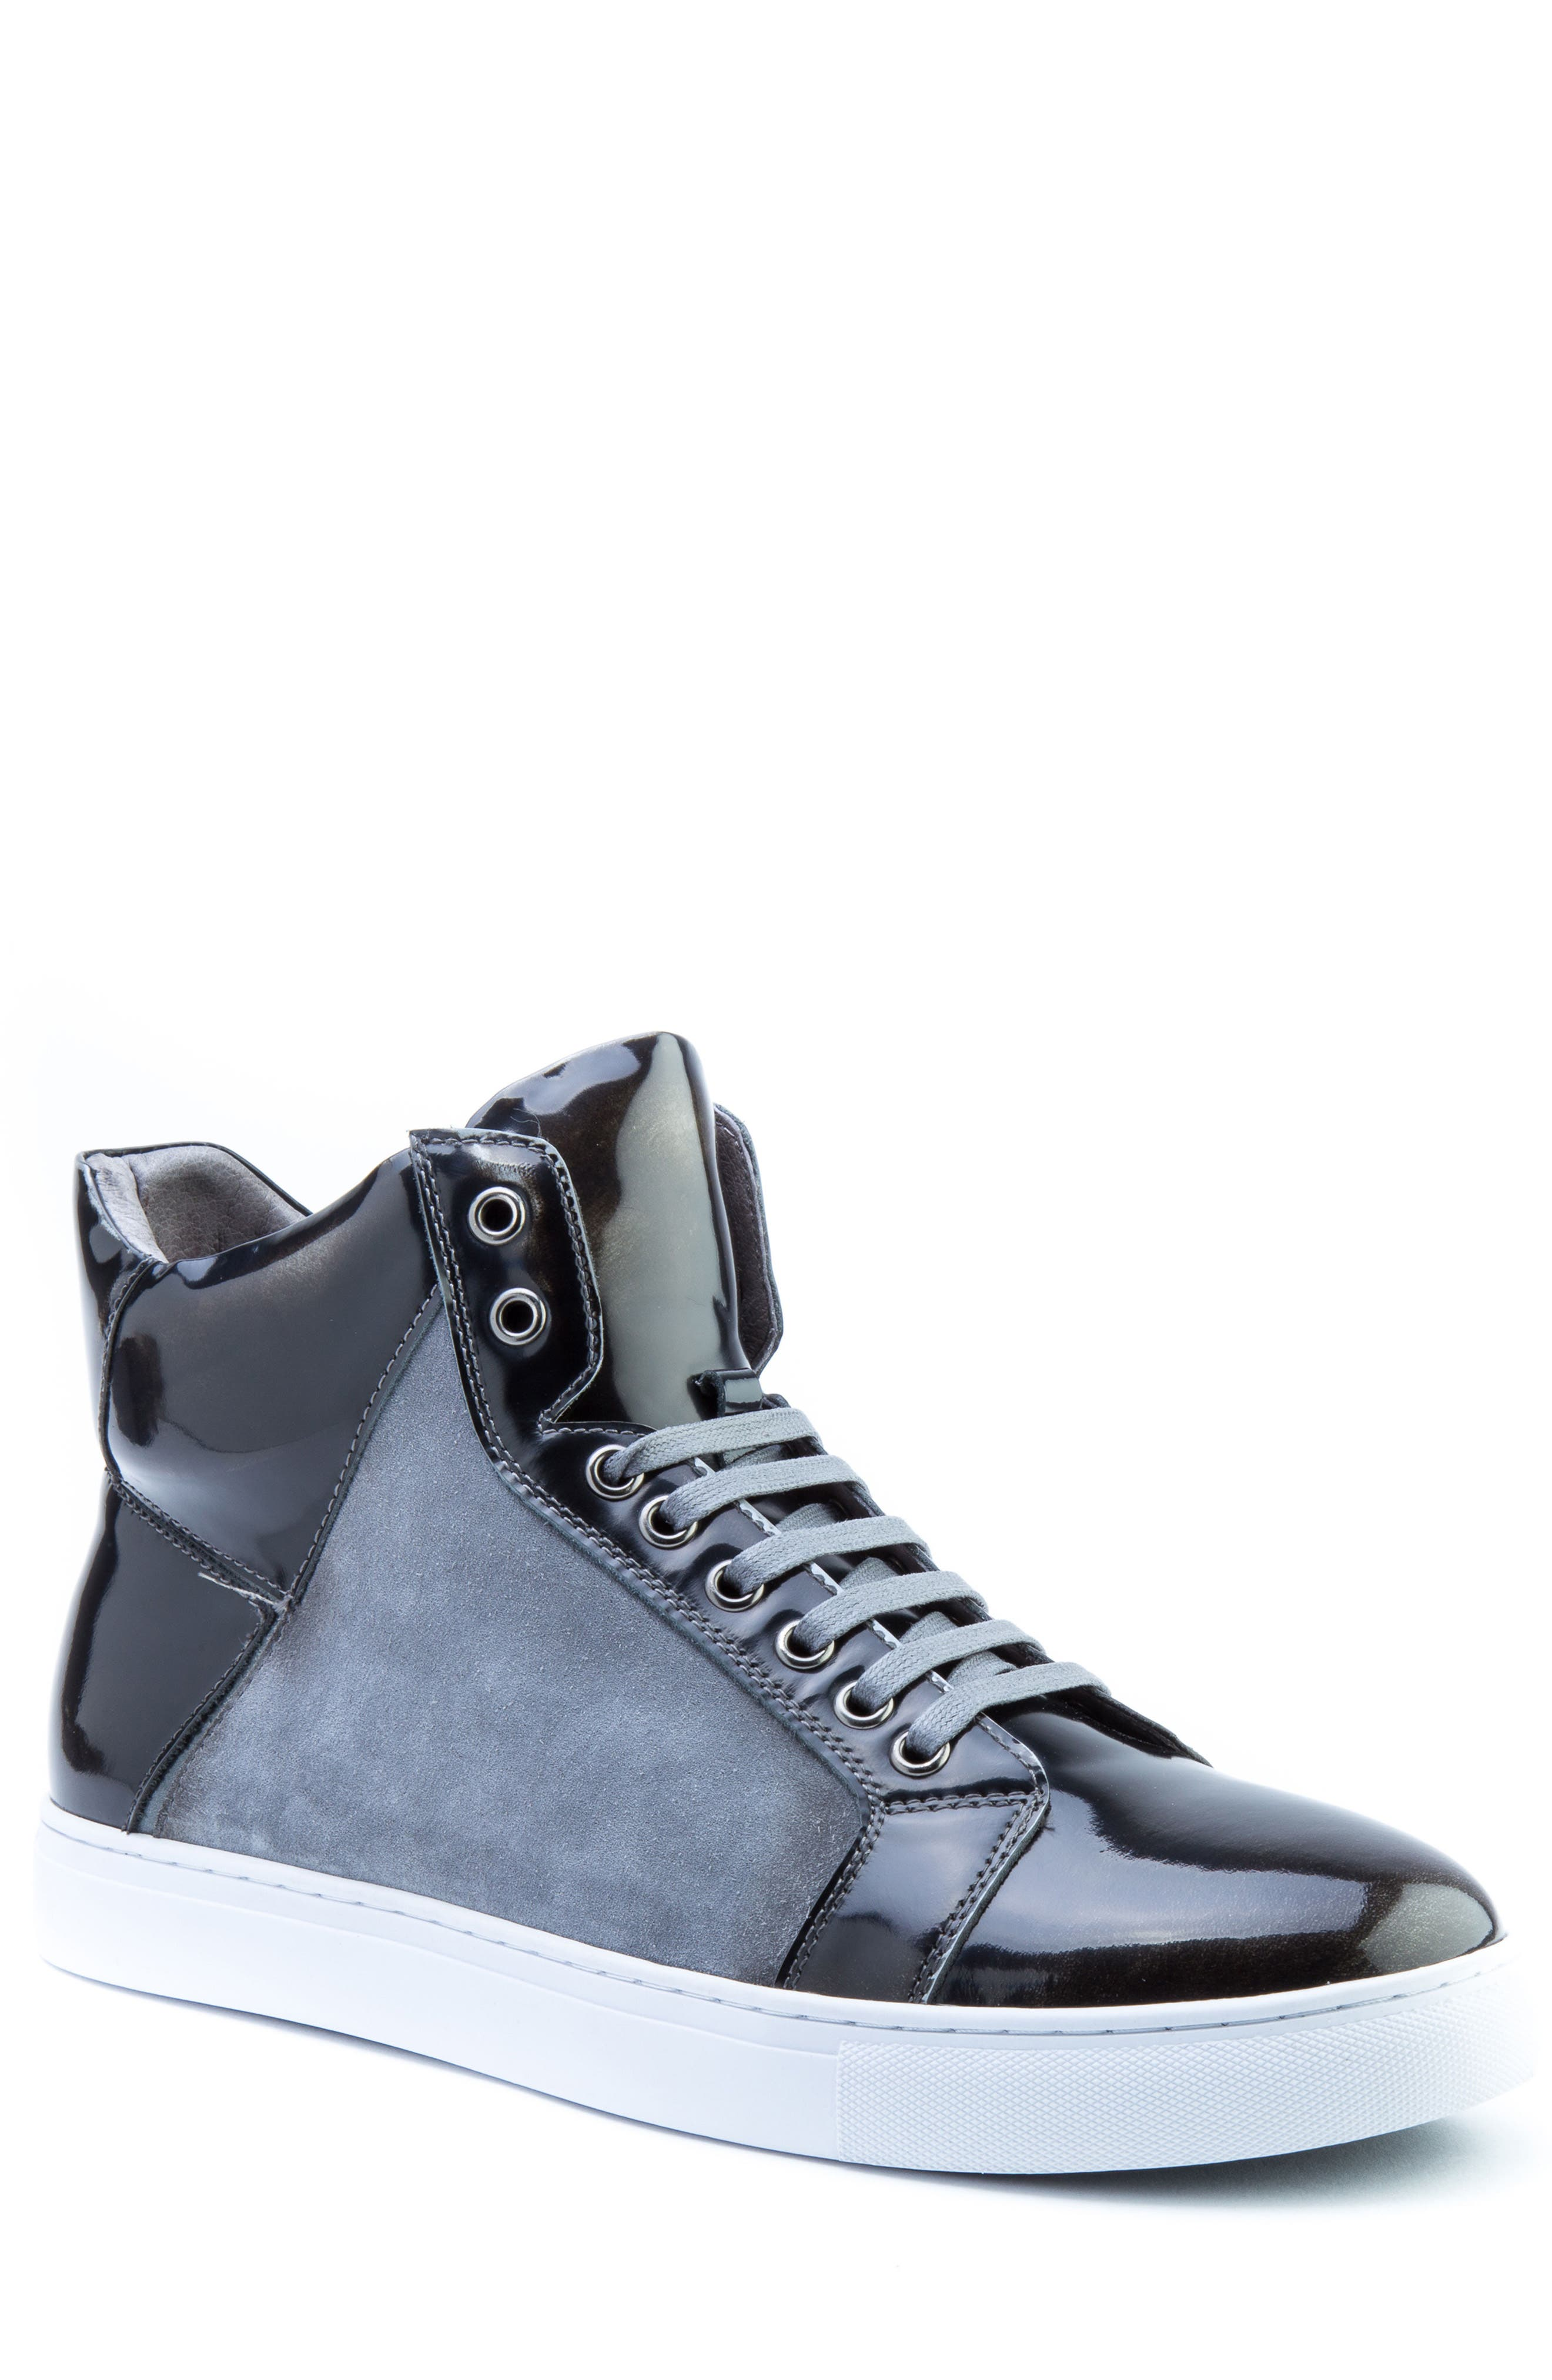 Douglas High Top Sneaker,                             Main thumbnail 1, color,                             BLACK LEATHER